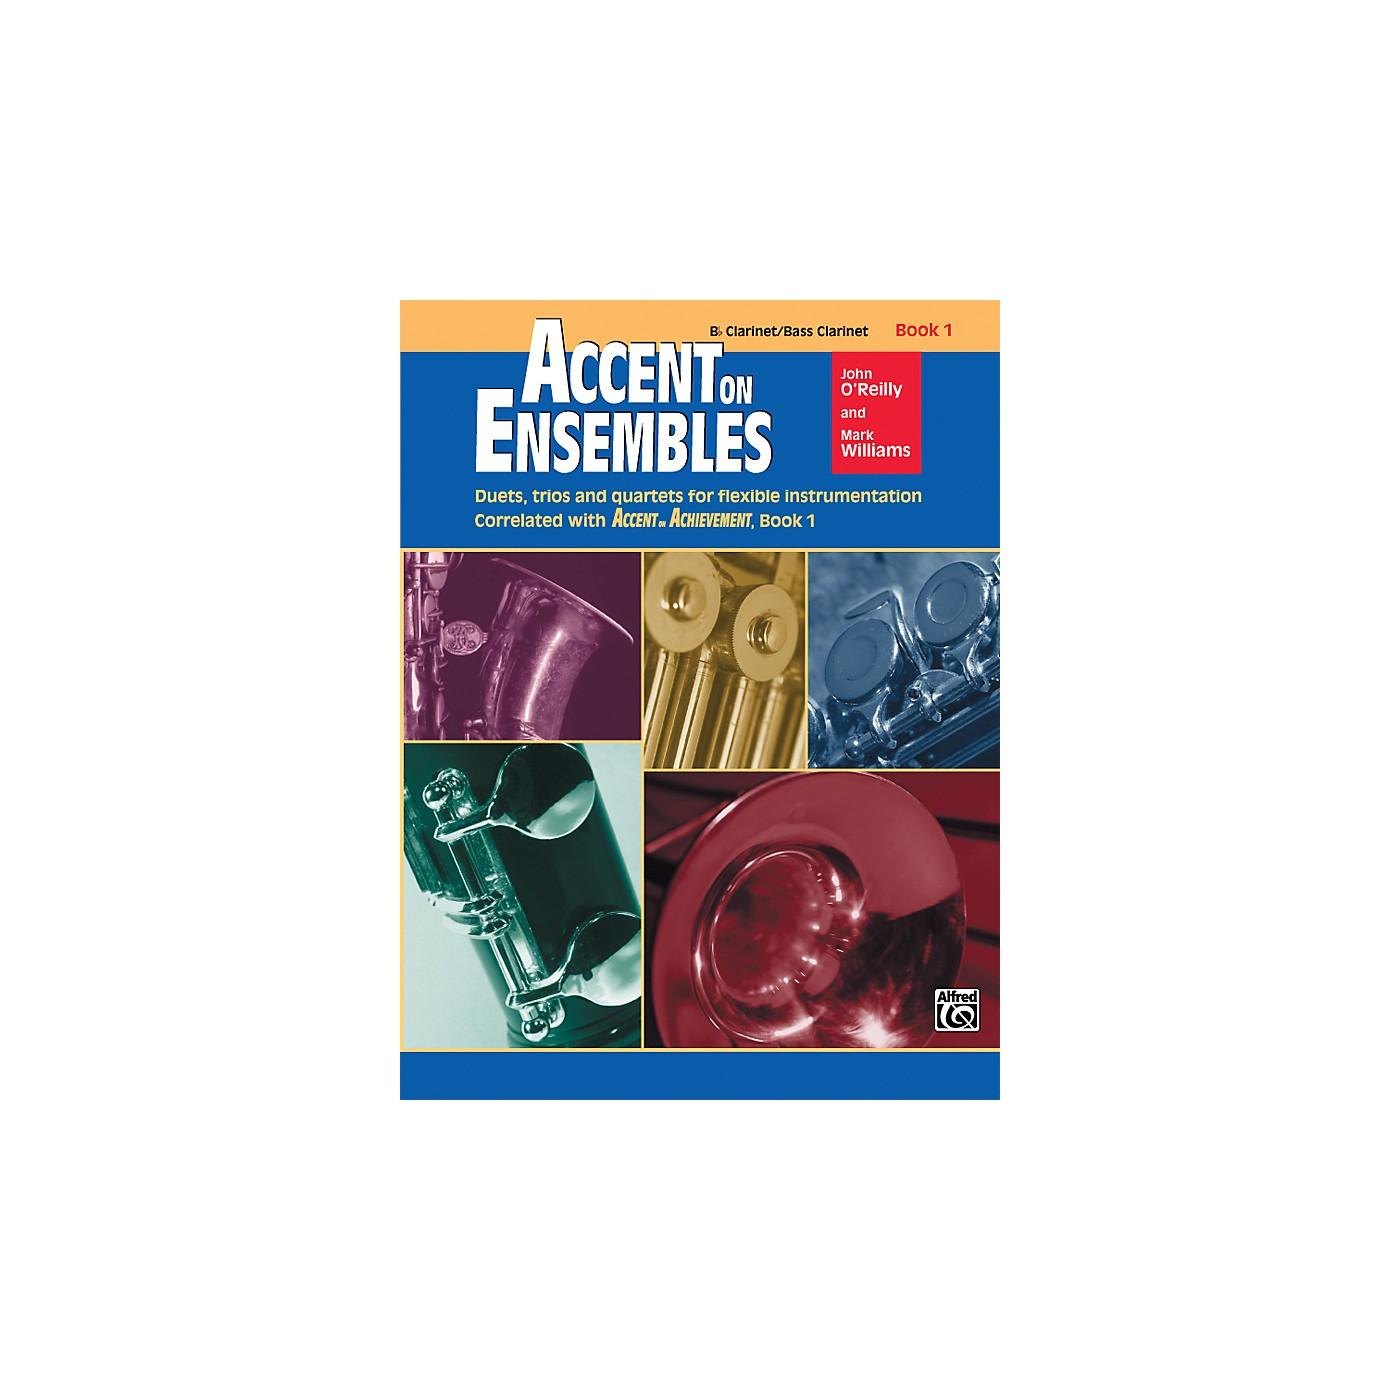 Alfred Accent on Ensembles Book 1 B-Flat Clarinet Bass Clarinet thumbnail